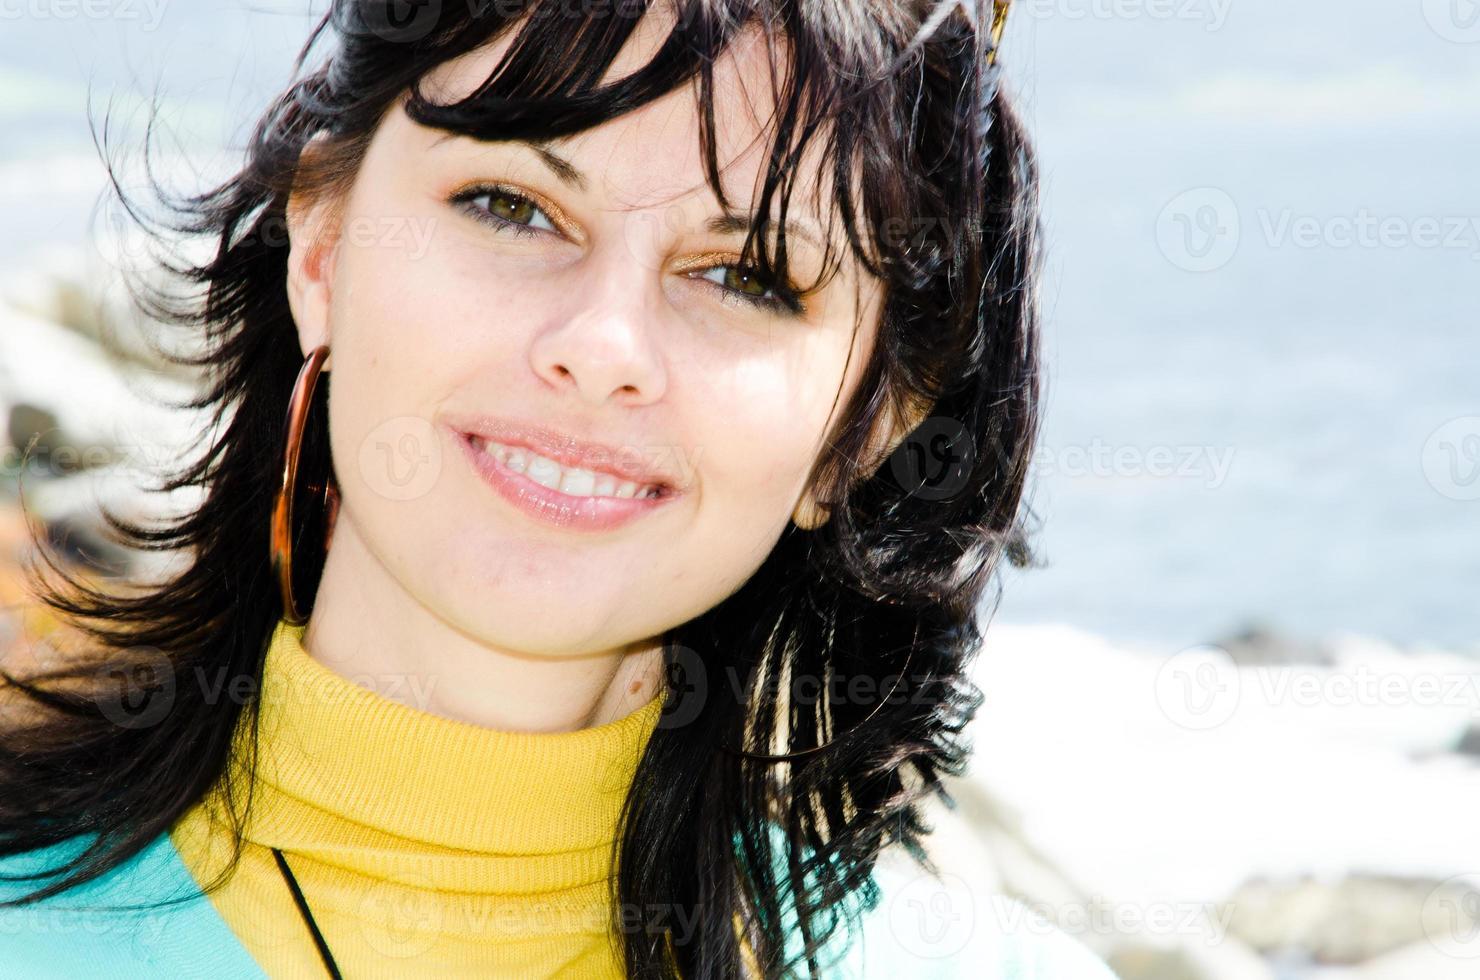 joyfull jovem sorridente morena caucasiana na praia ensolarada brilhante foto